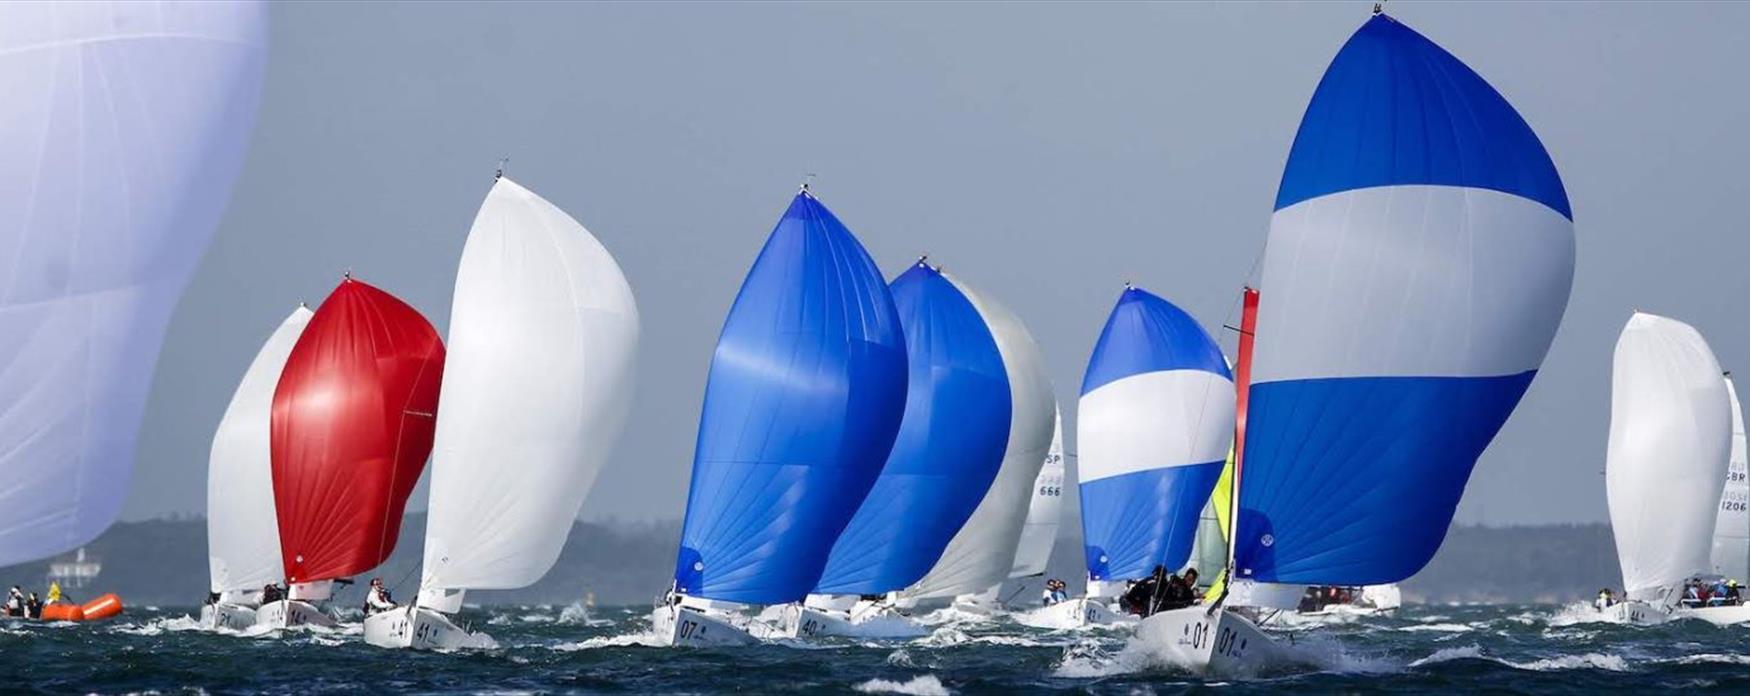 Sailing on The English Riviera